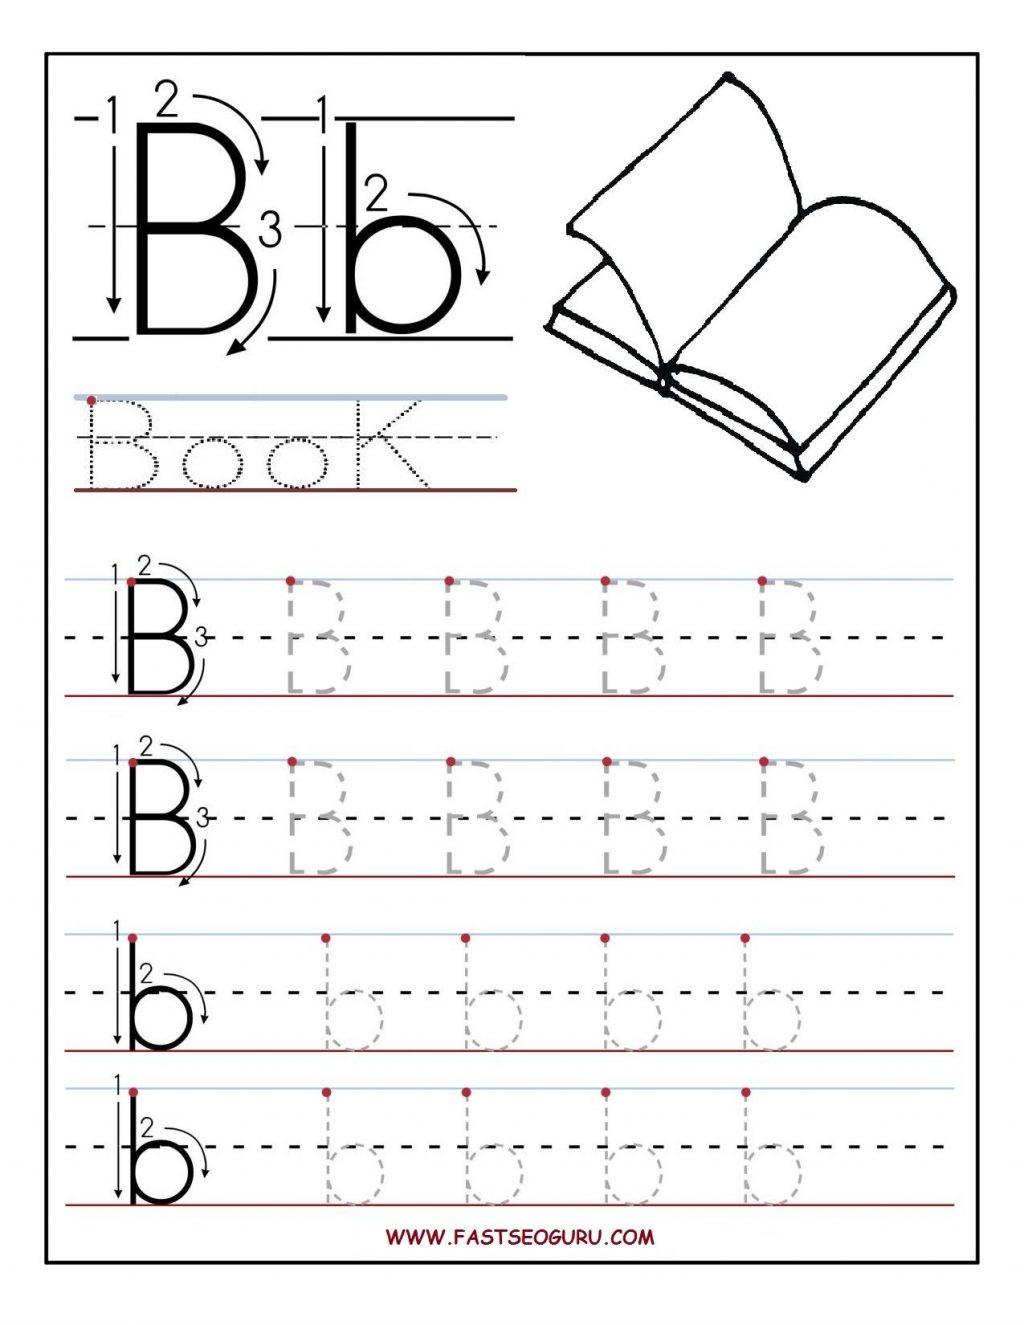 Worksheet ~ Free Pre K Printables Worksheet Printable Letter regarding Pre-K Alphabet Writing Worksheets